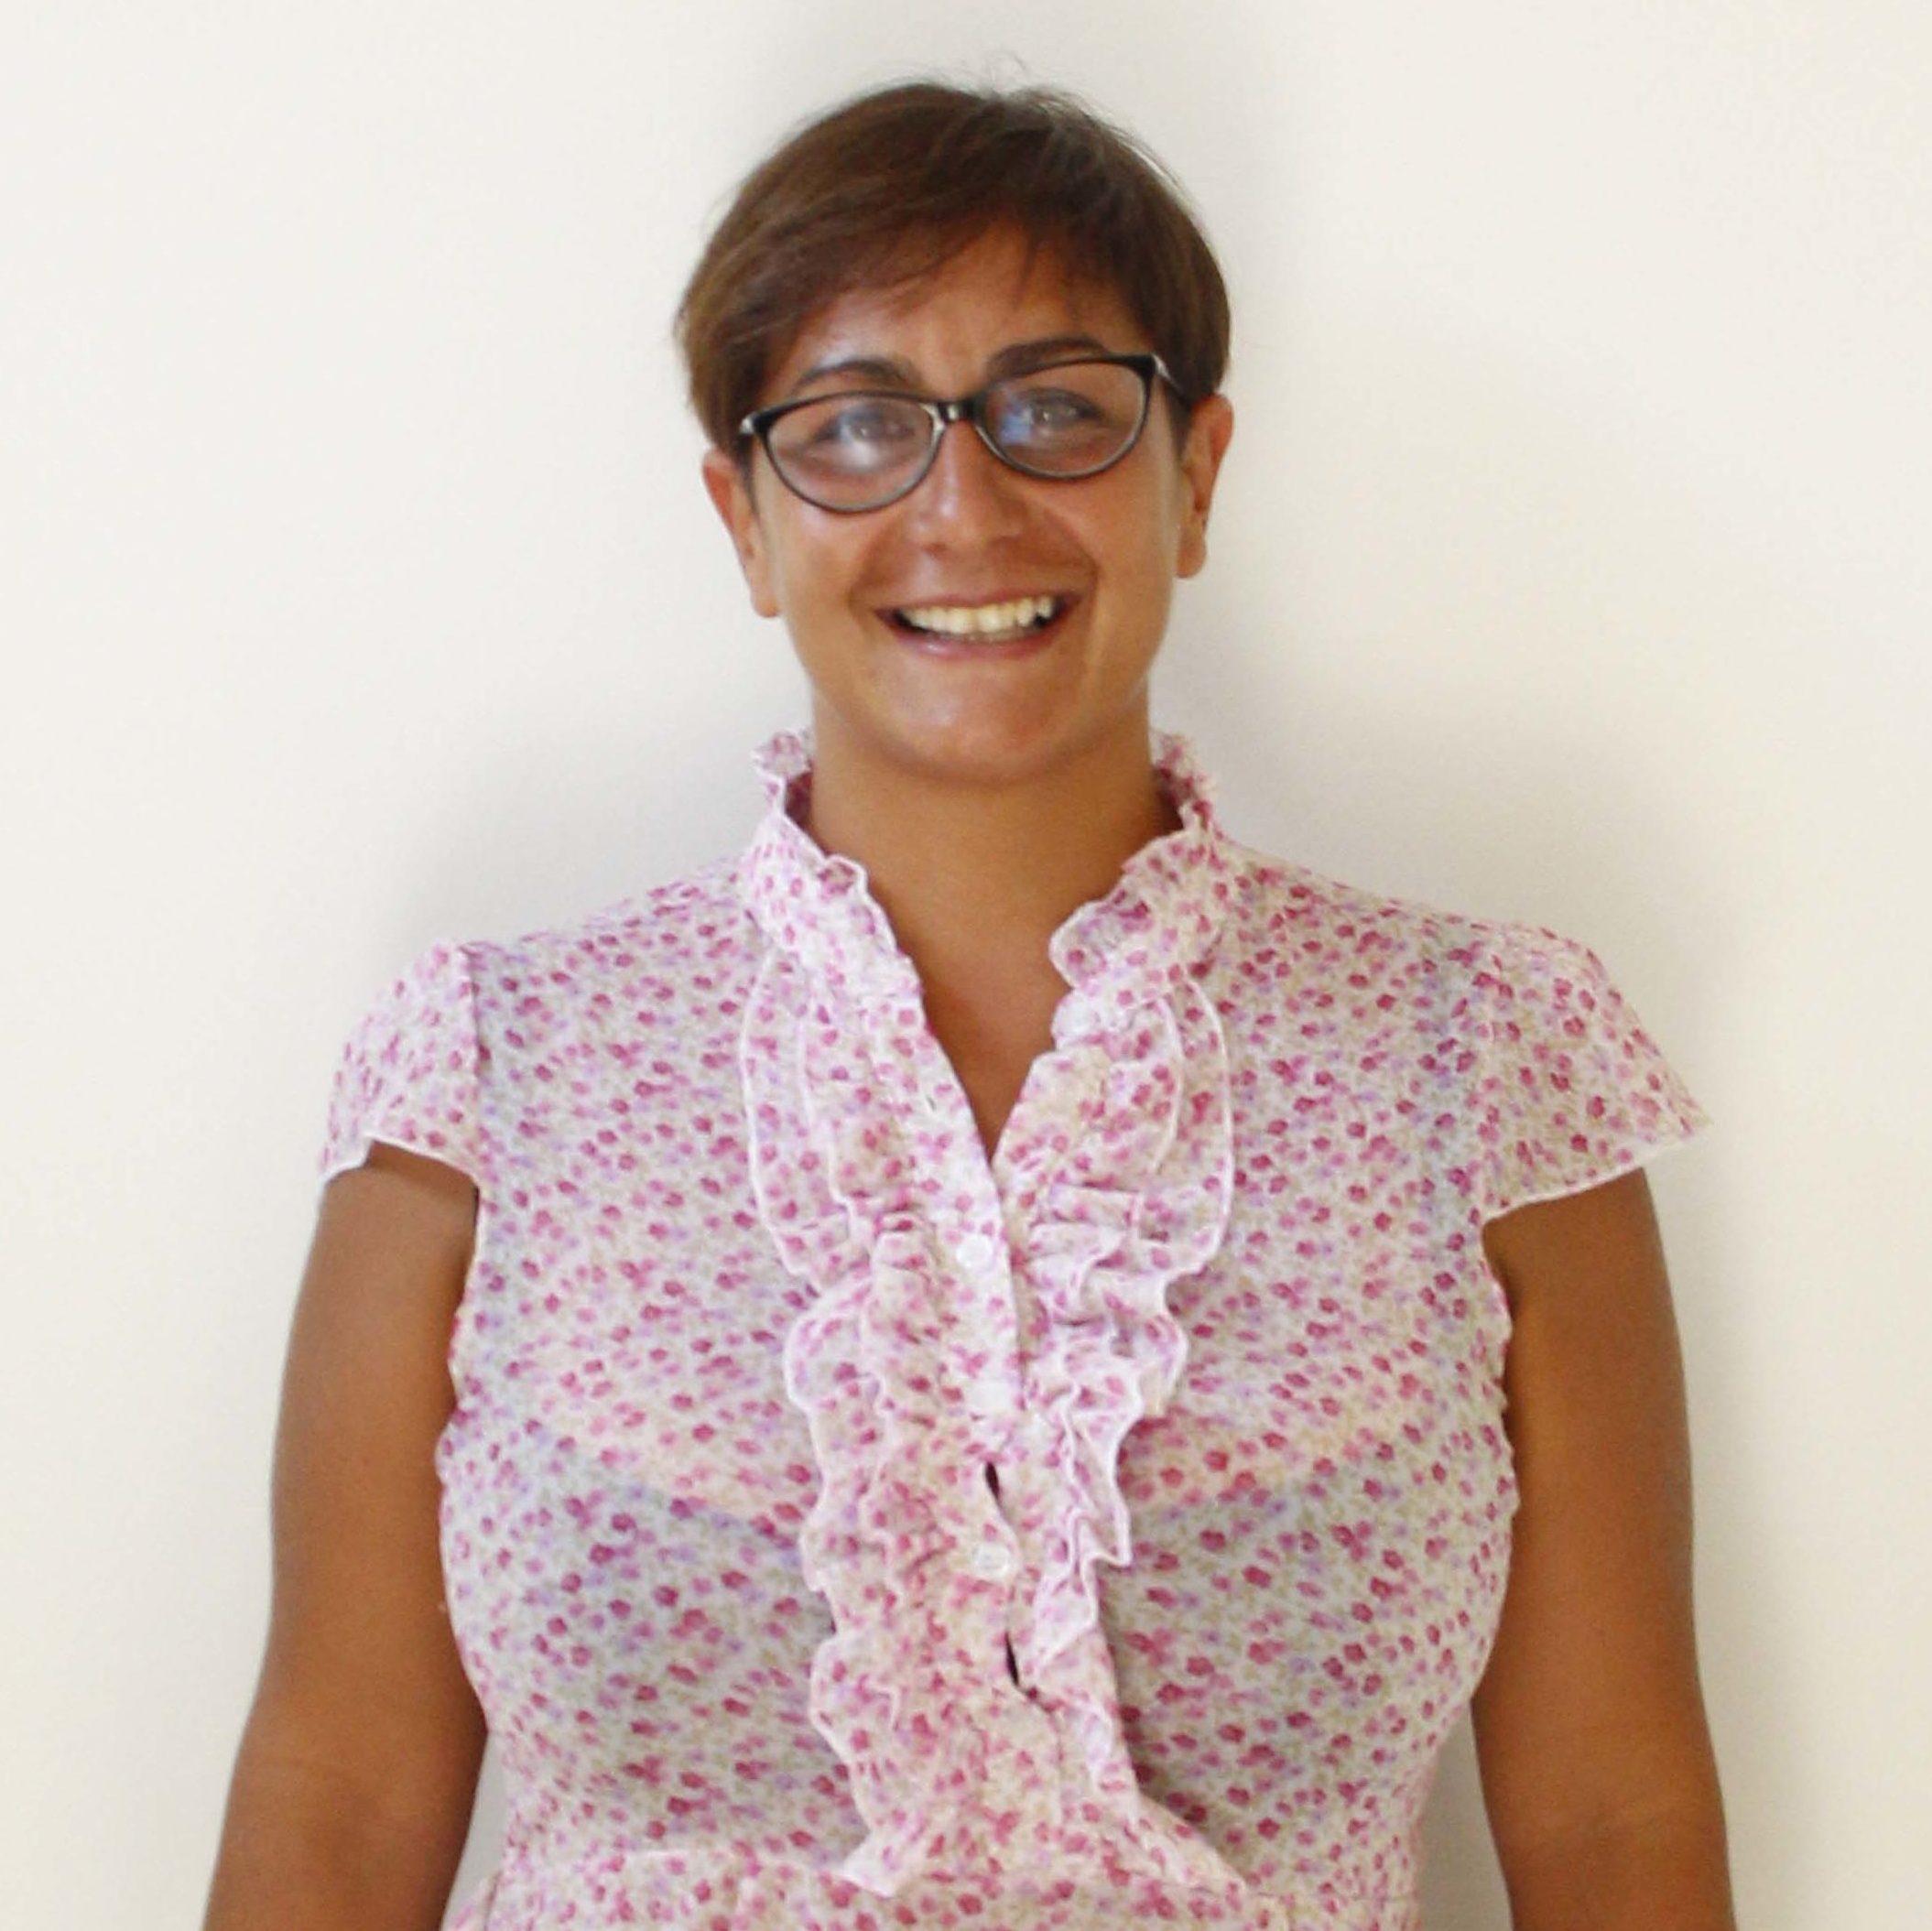 Valeria Congedo